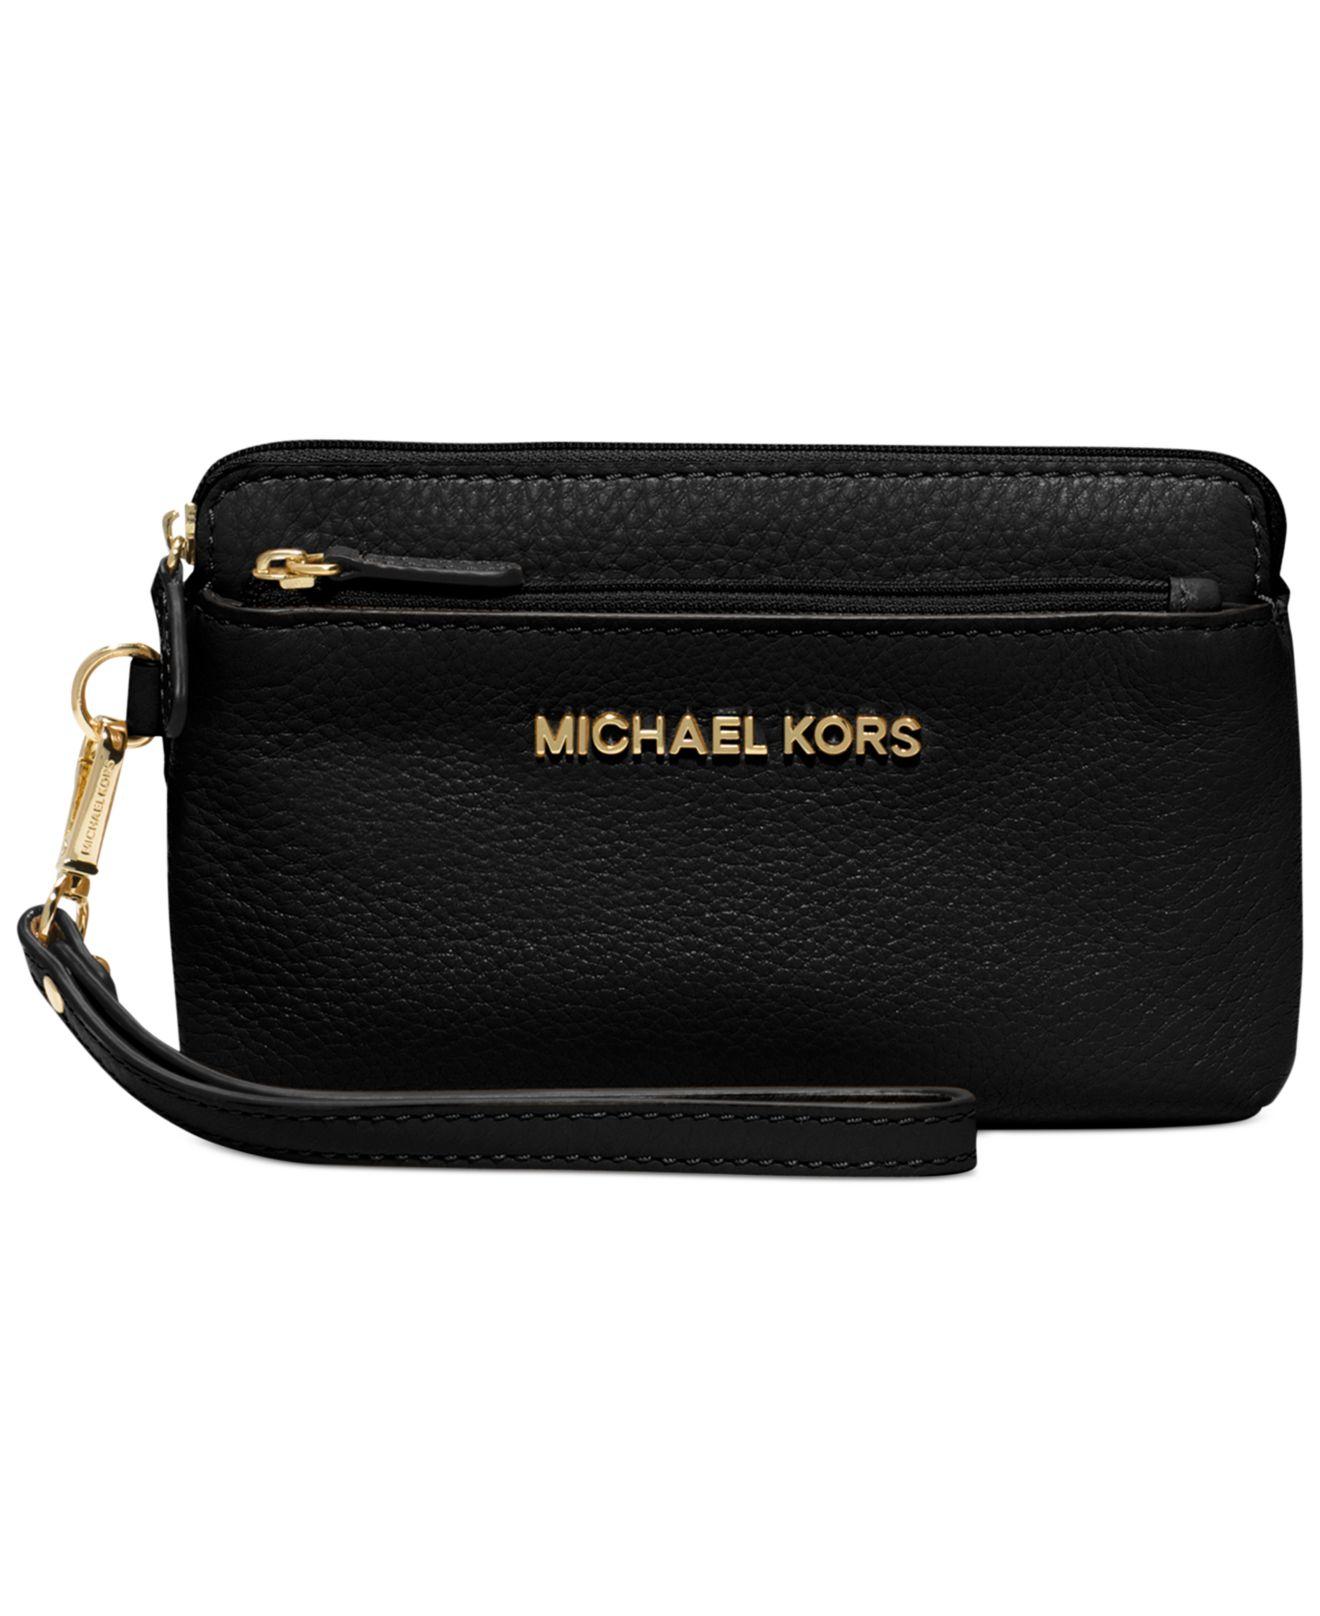 Black Michael Kors Iphone Wristlet